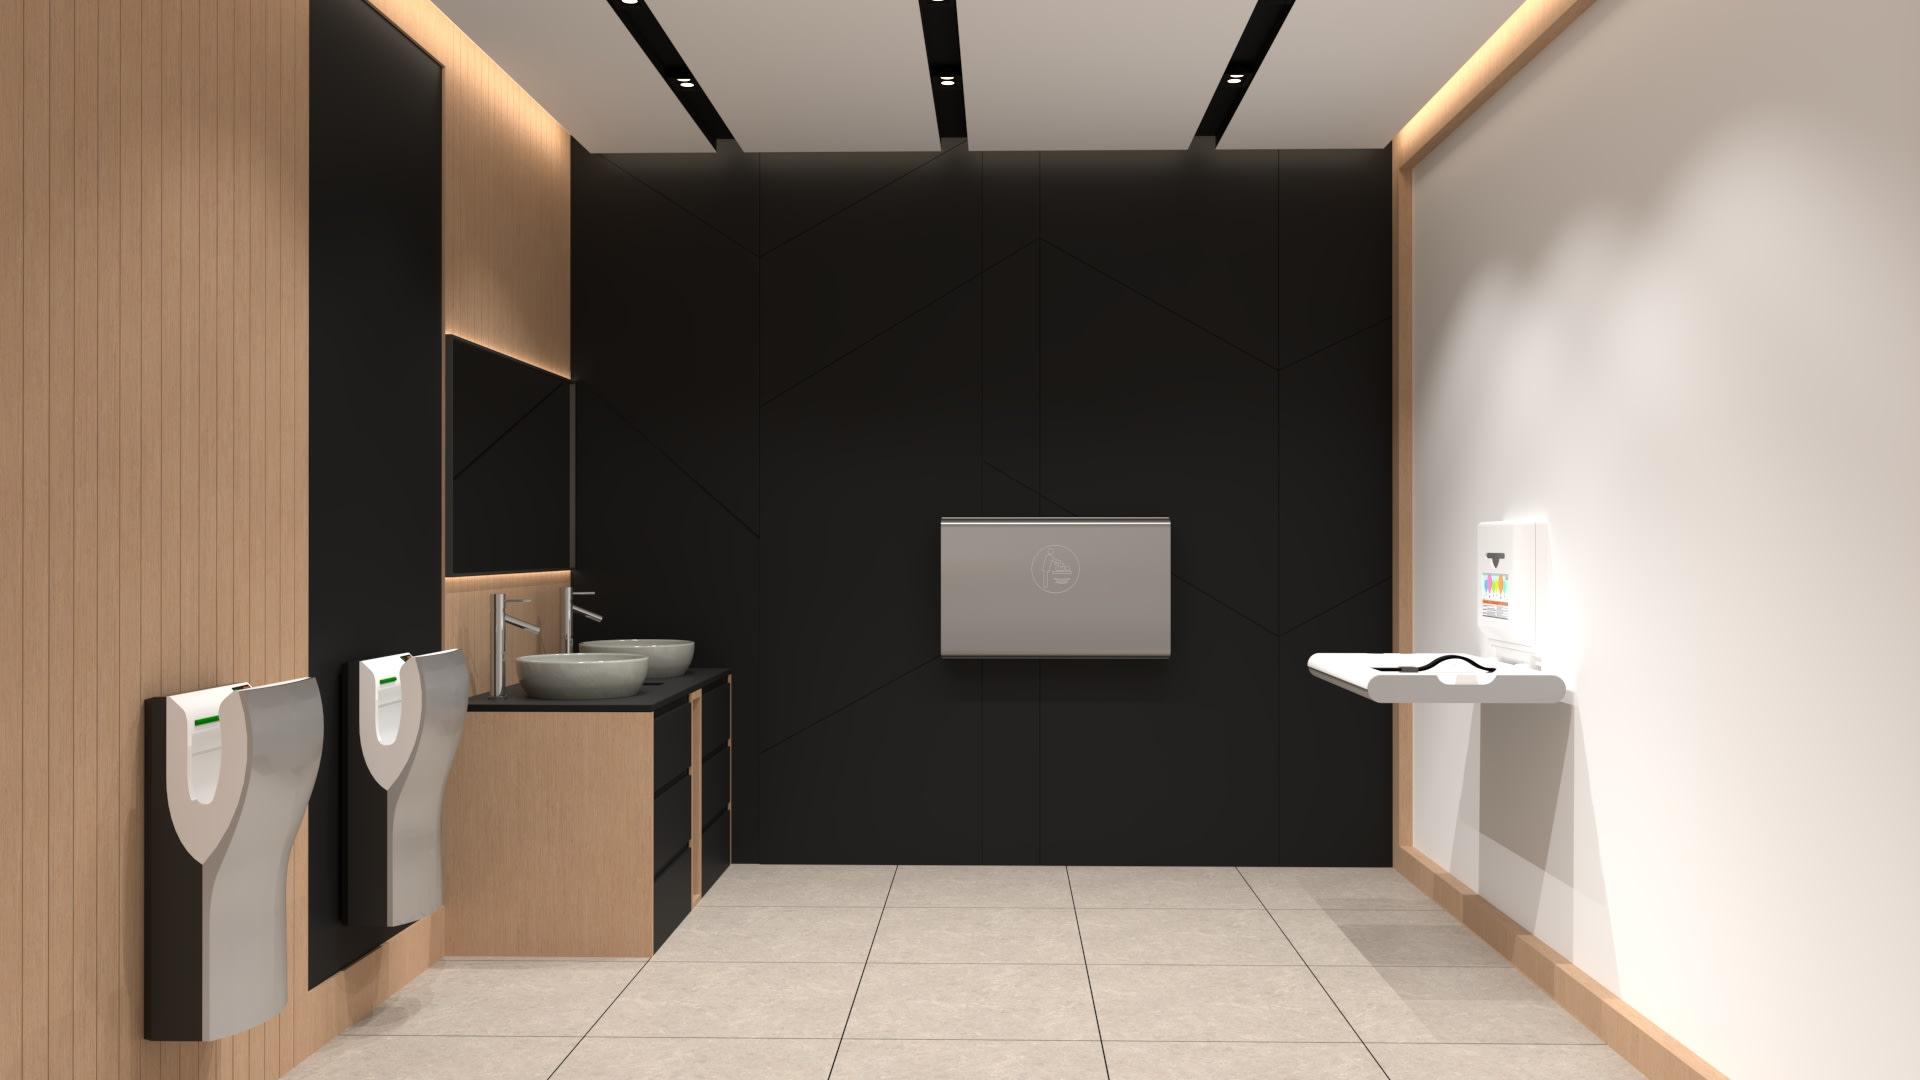 m14acs-rendering